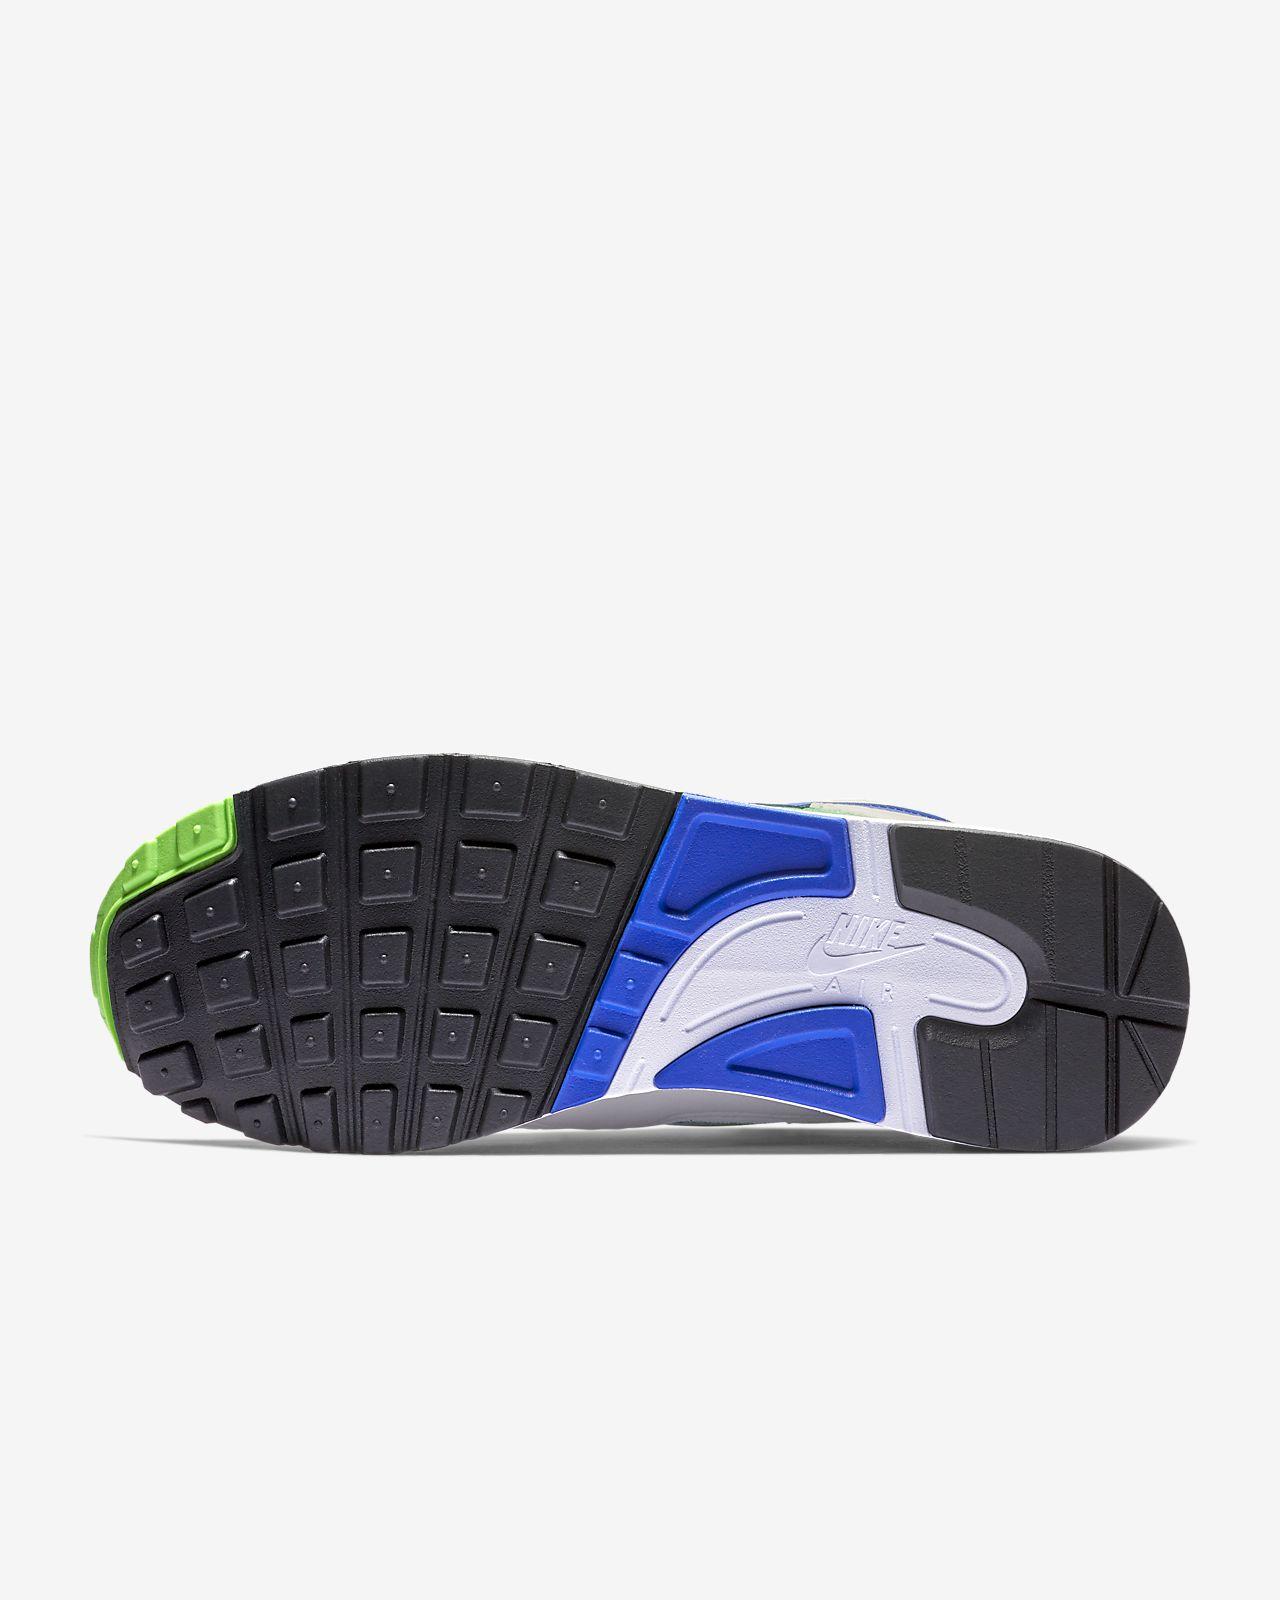 9d01bbec5a3a Low Resolution Nike Air Skylon II Men s Shoe Nike Air Skylon II Men s Shoe